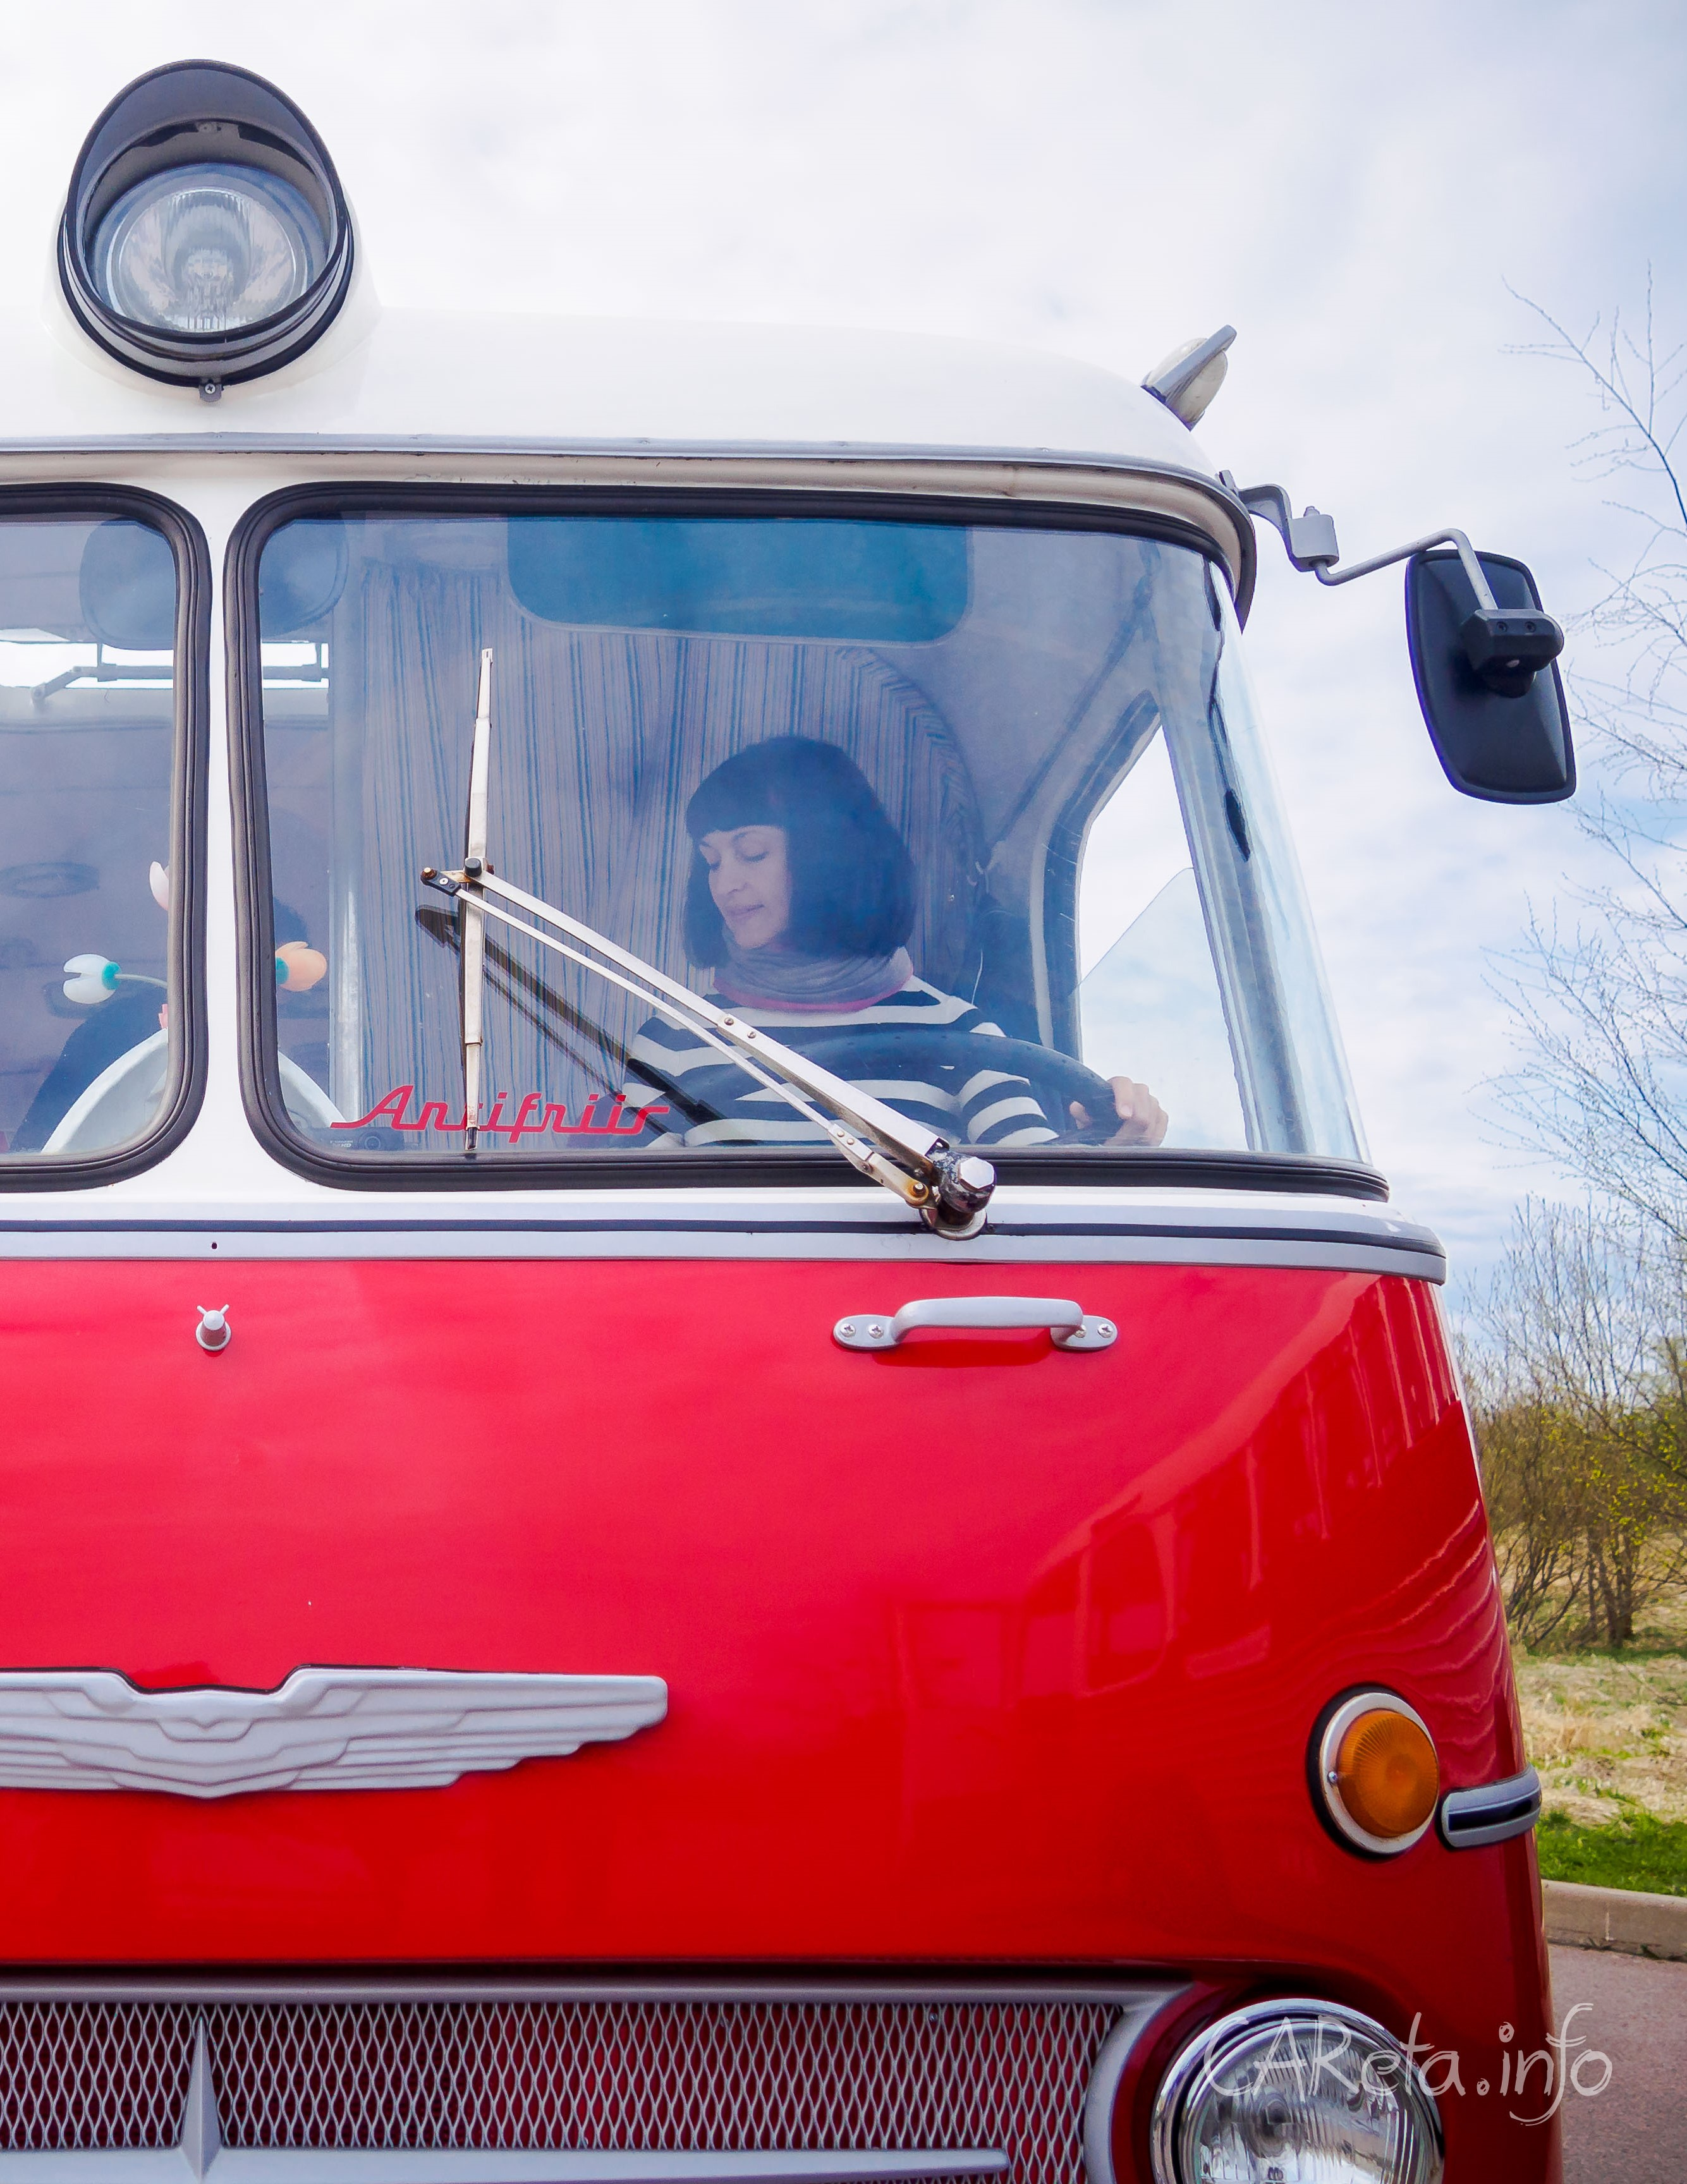 Альтернатива путешествиям на автомобиле